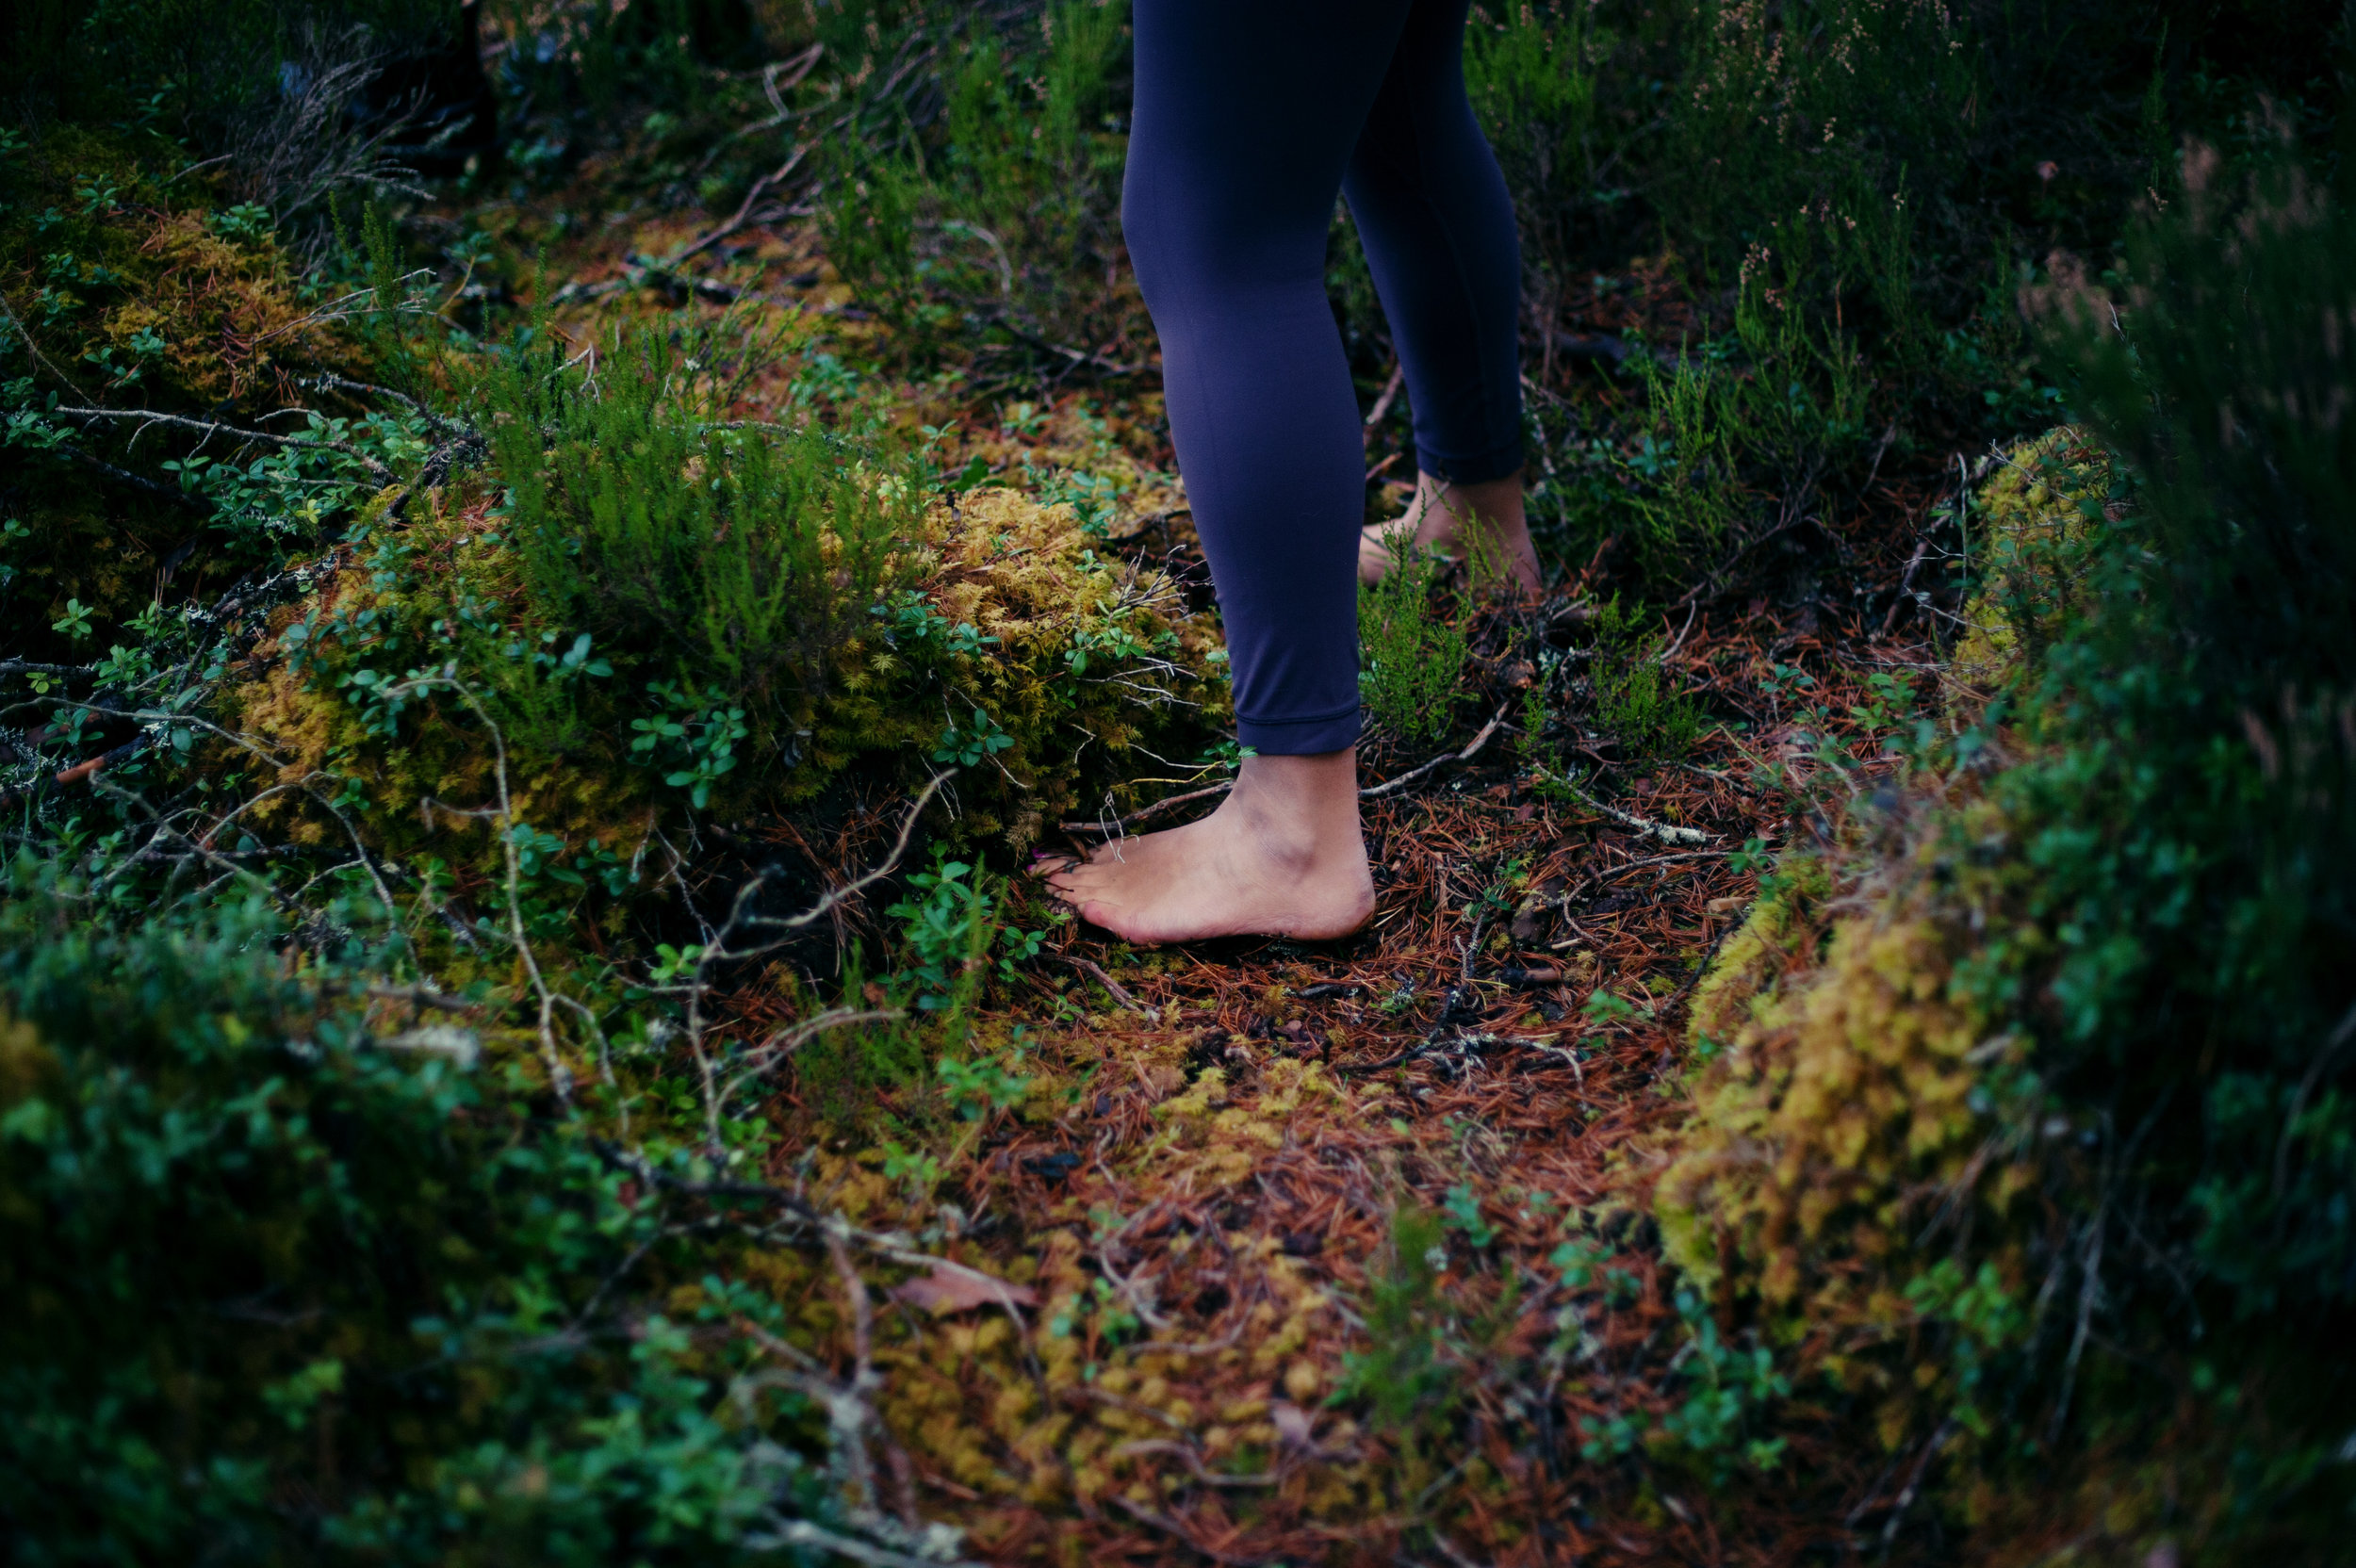 yoga-picture-scottish-highlands-katy-scherer-feet.jpg